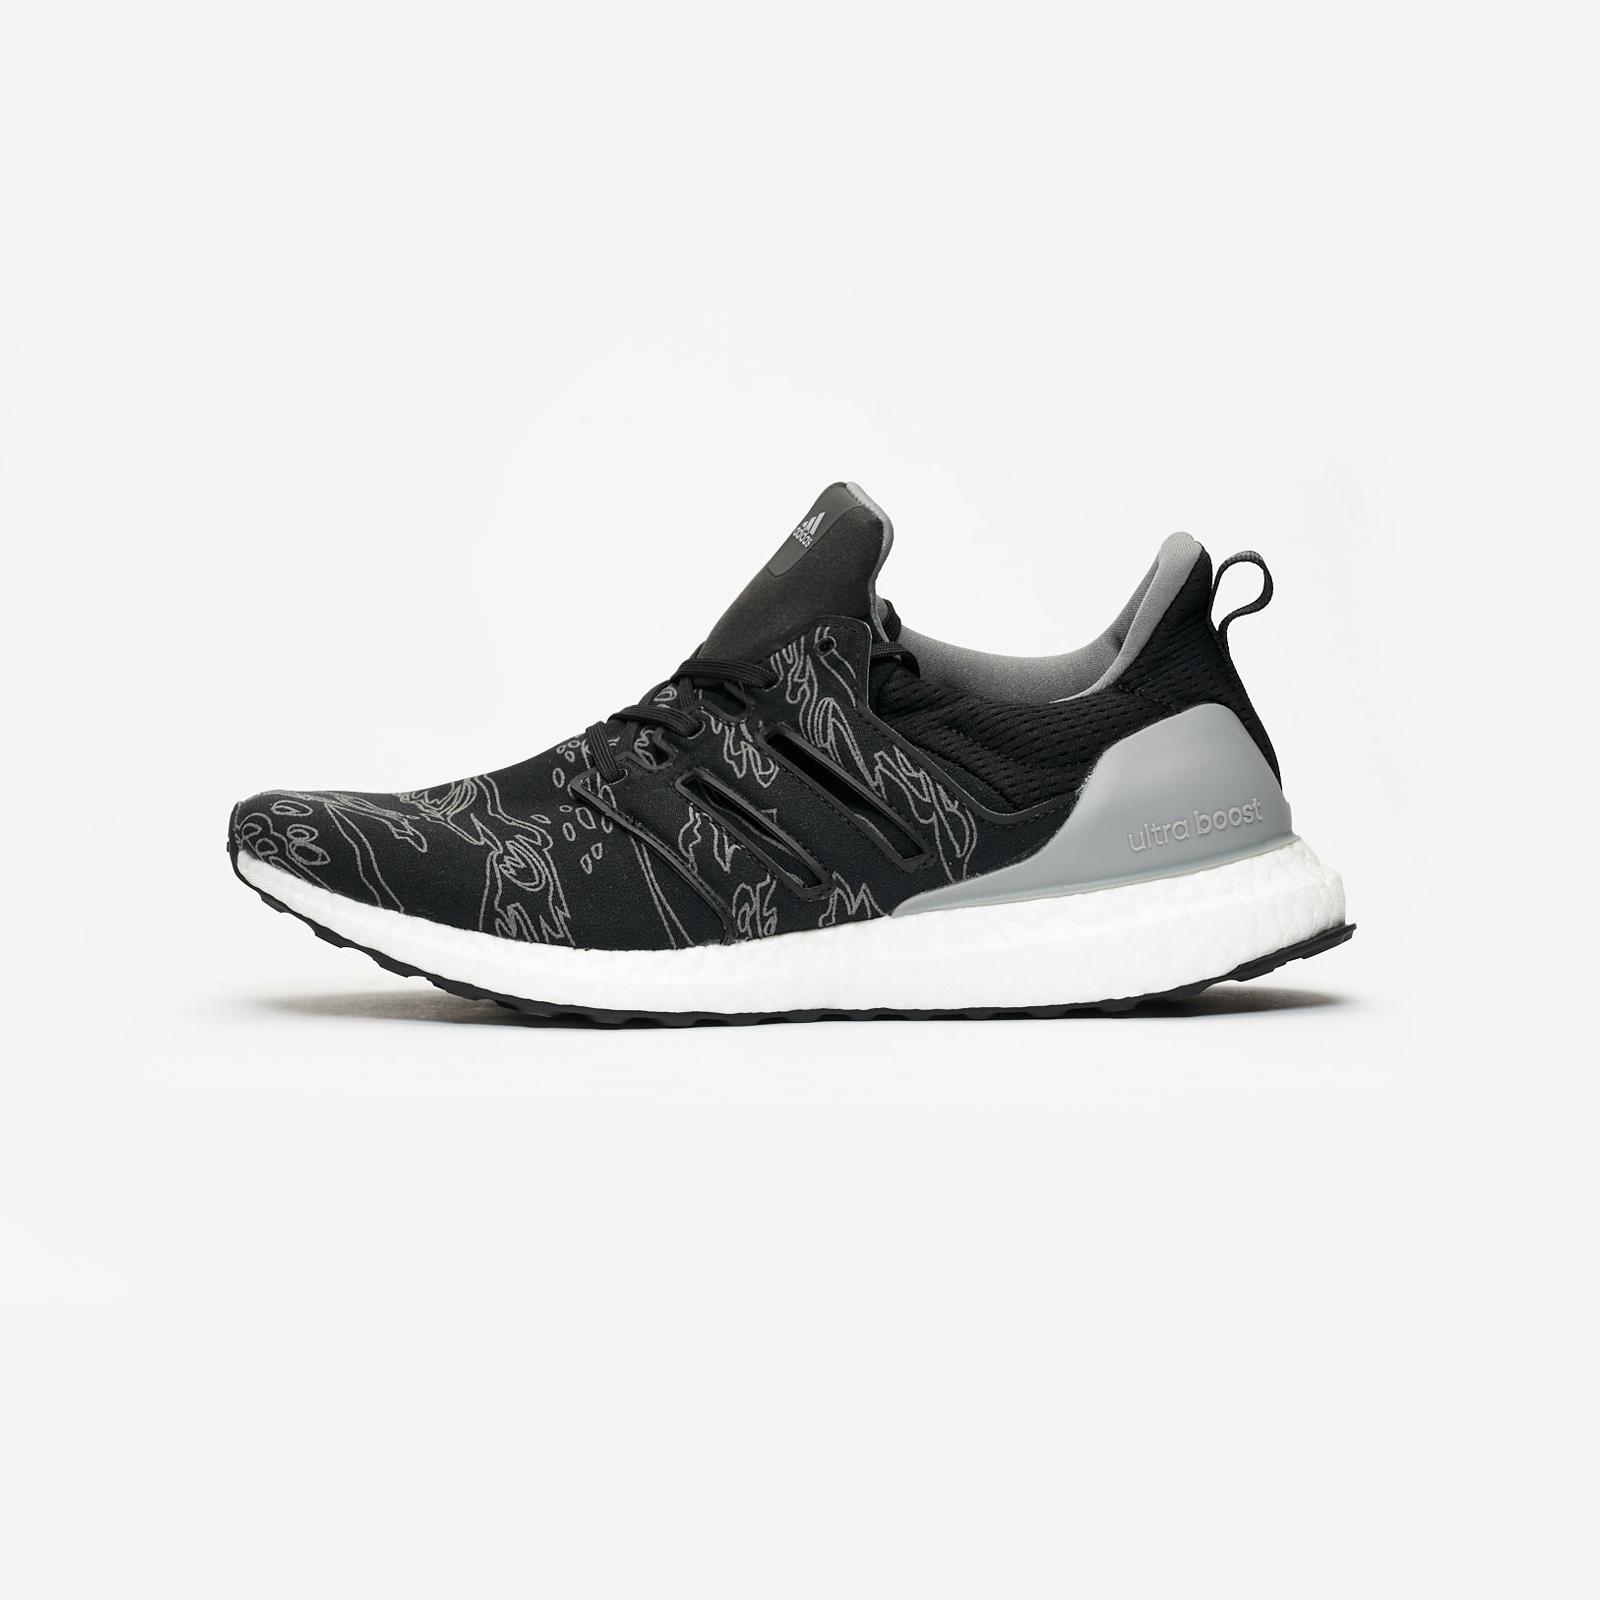 25185aa966660 adidas UltraBOOST x UNDFTD - Bc0472 - Sneakersnstuff